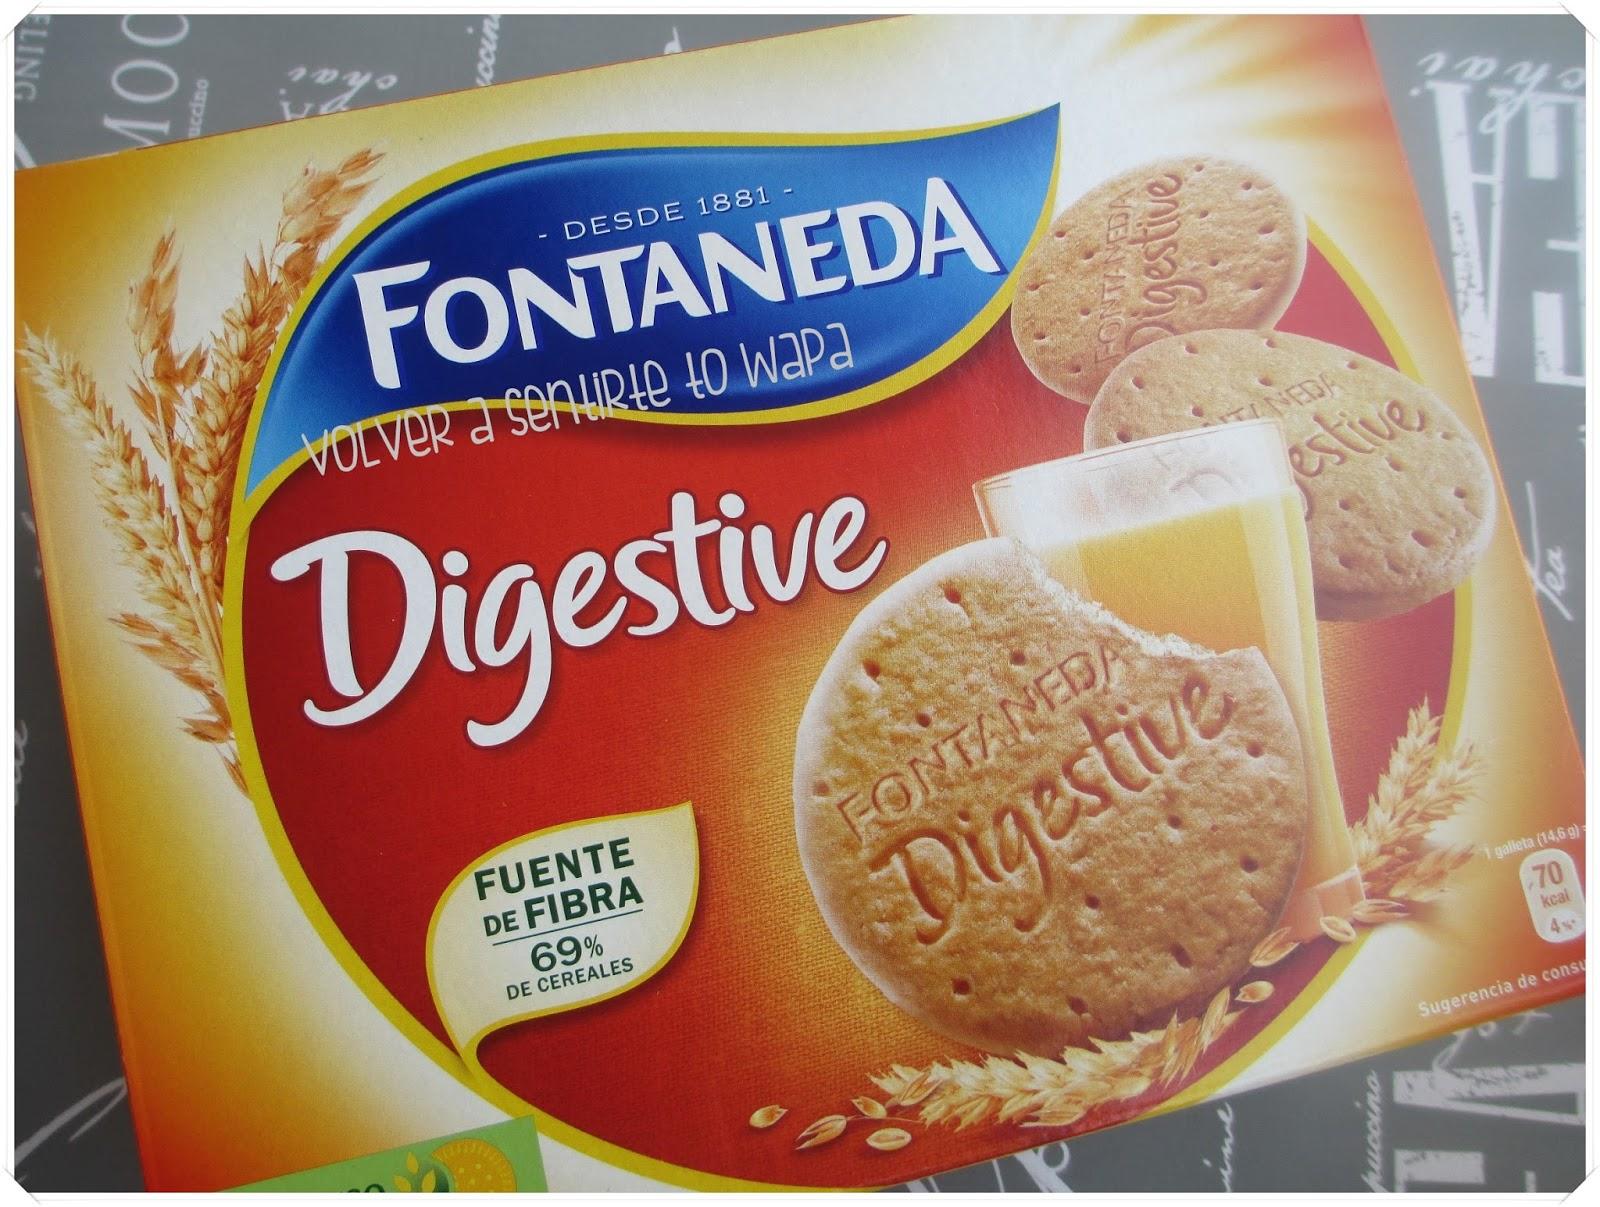 degustabox 'Vuelta al Cole' - Agosto 2014 - Fontaneda Digestive